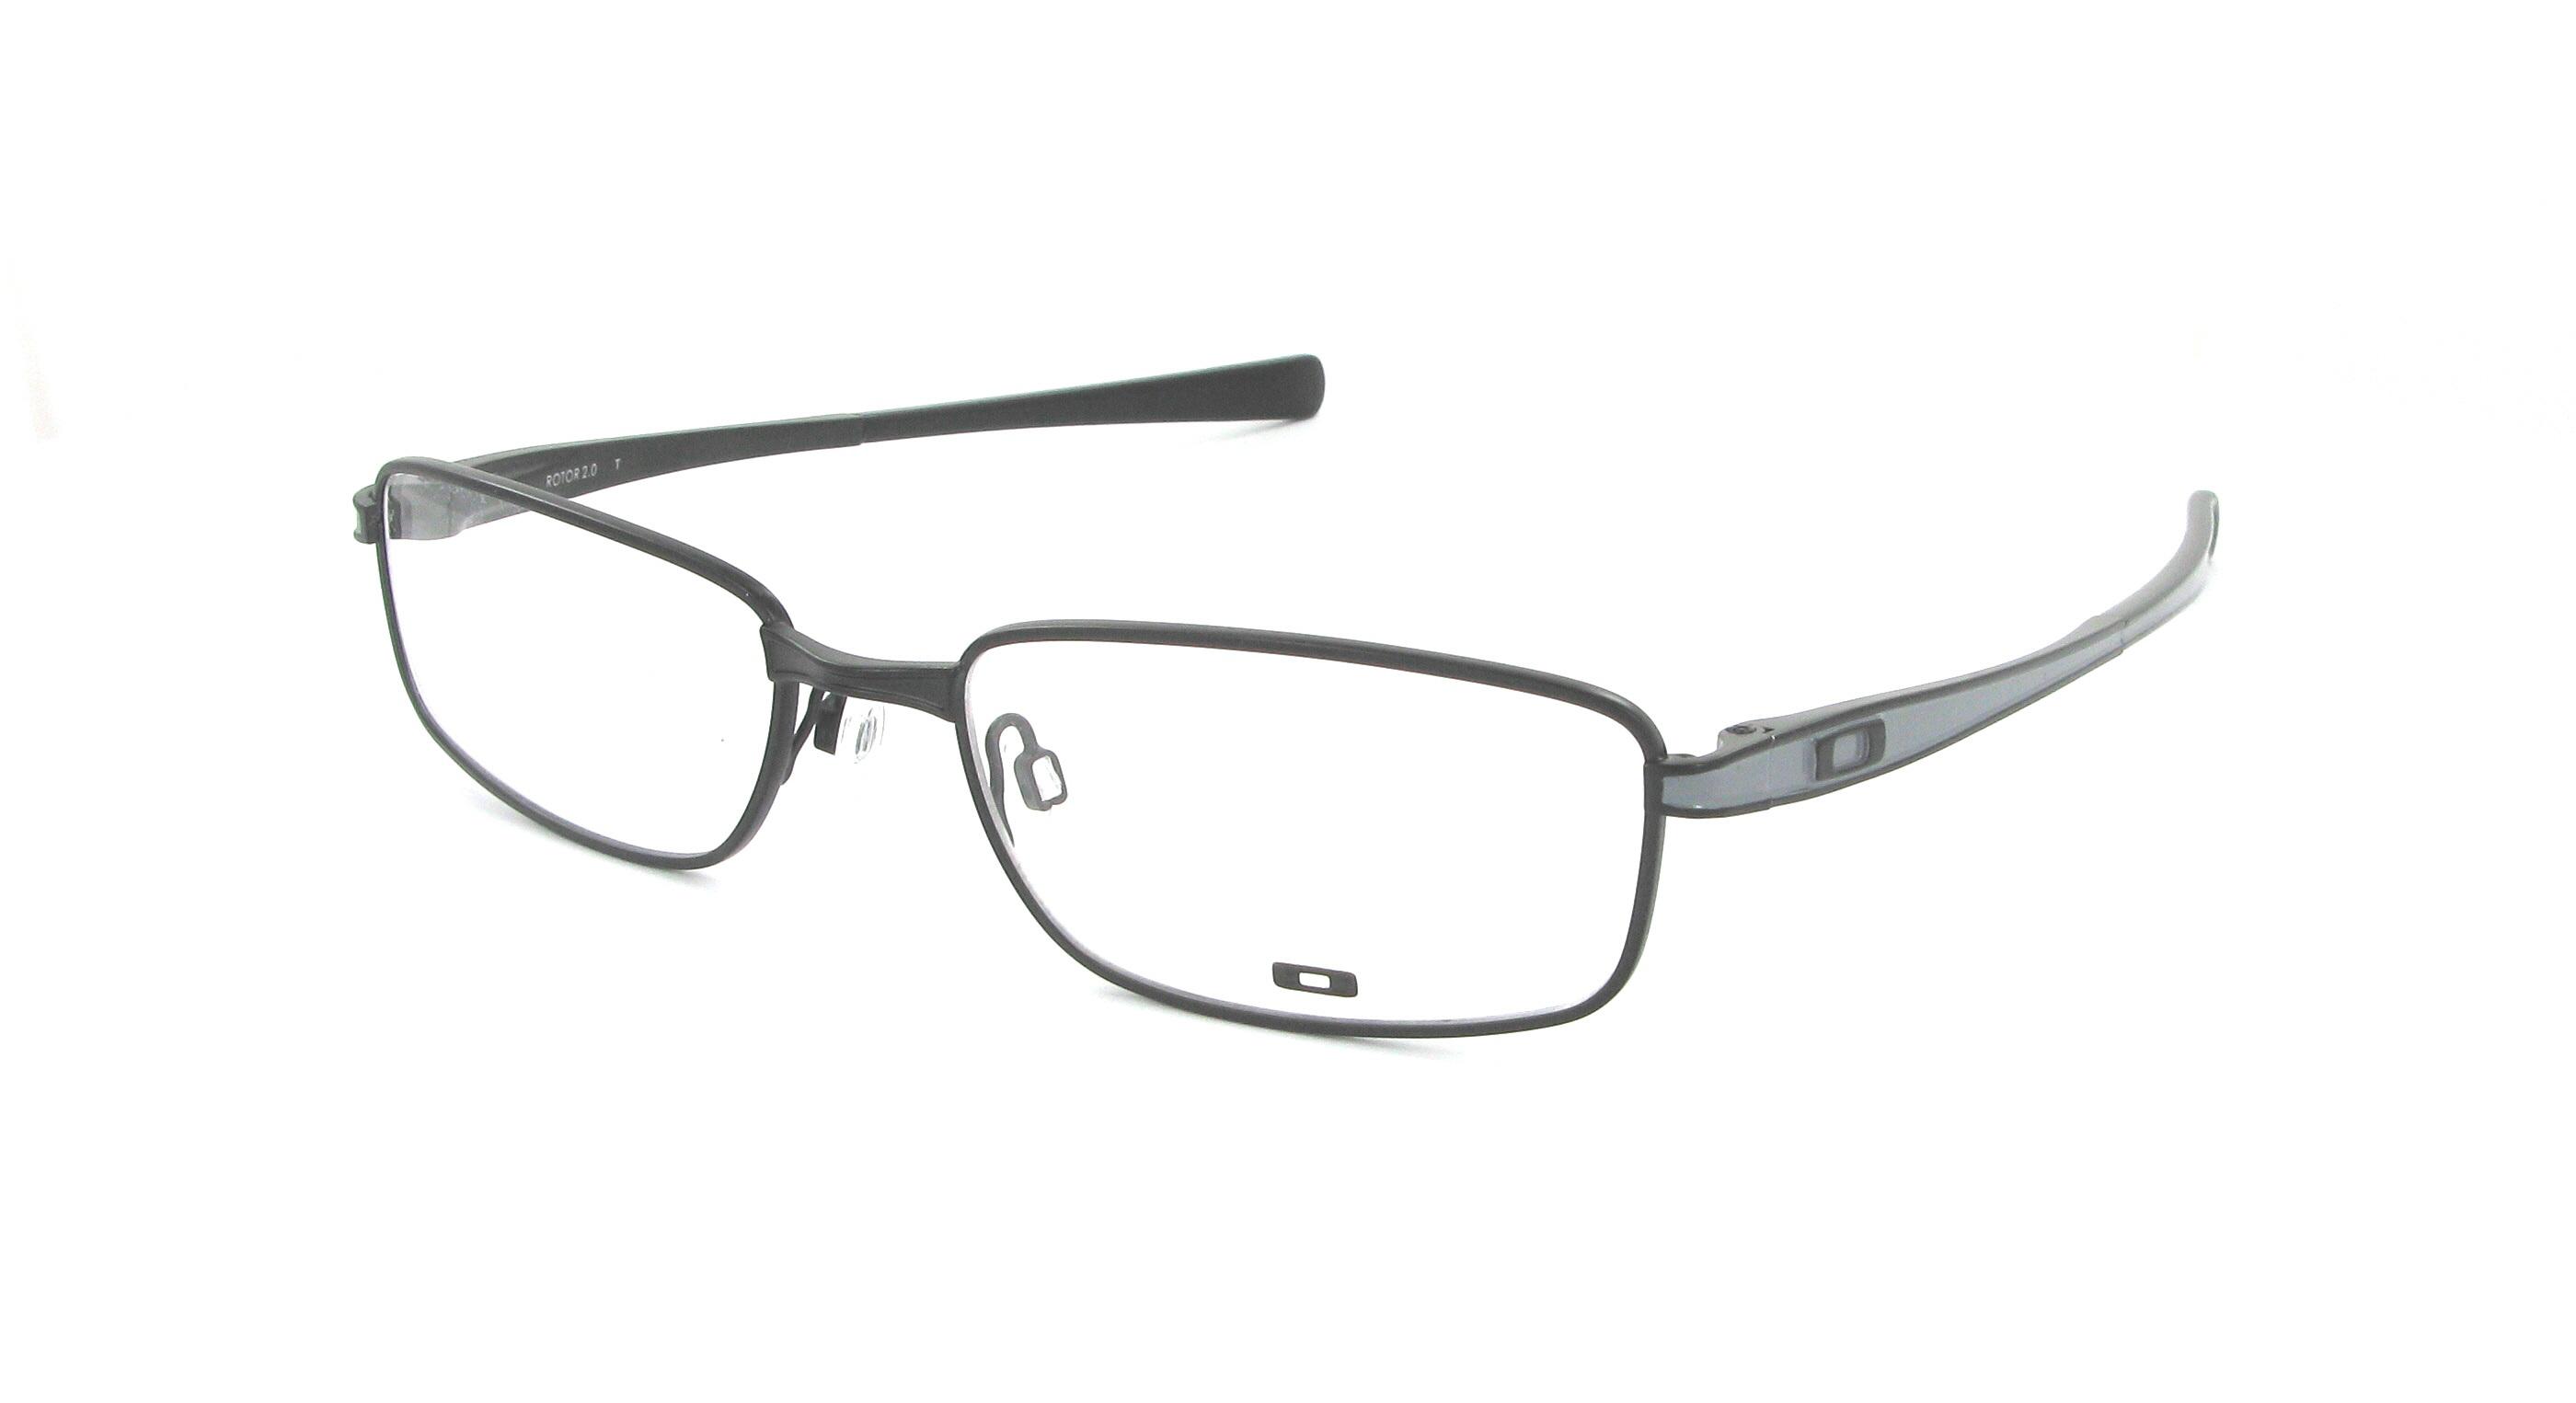 lunette de vue oakley optic 2000